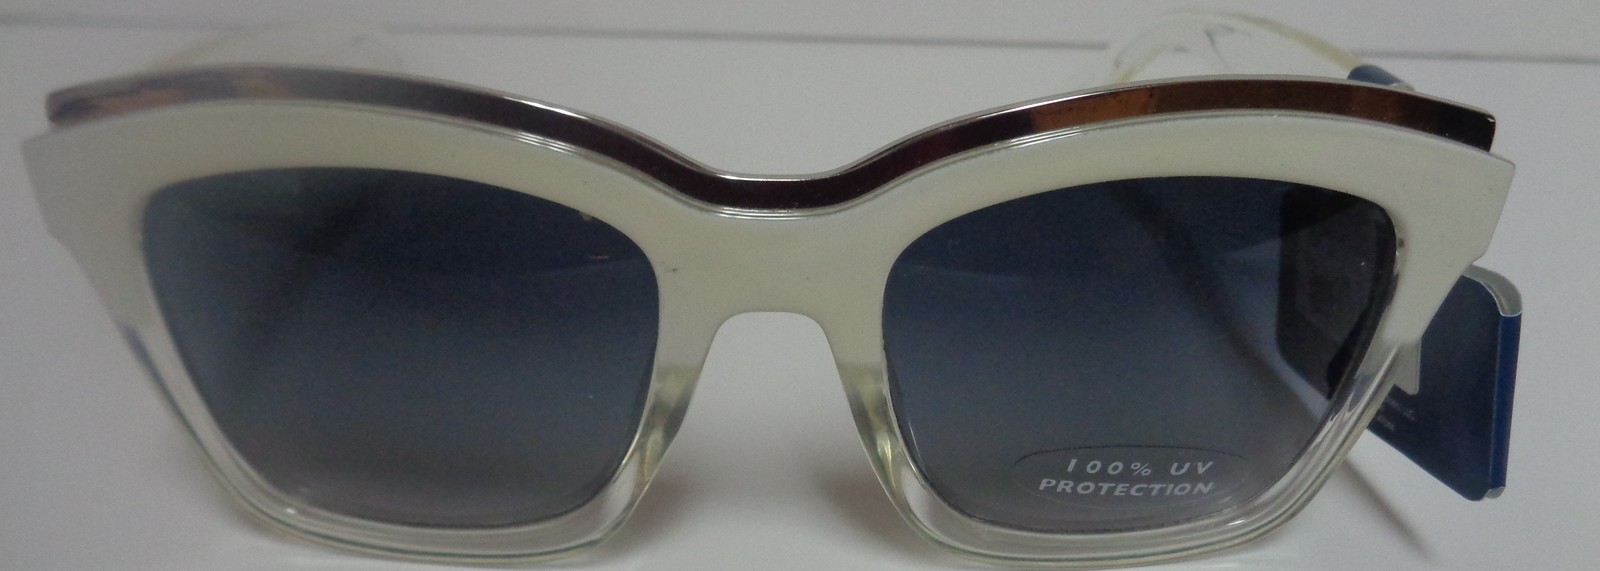 Falls Creek White Clear Sunglasses NWT 100% UV Protection image 4